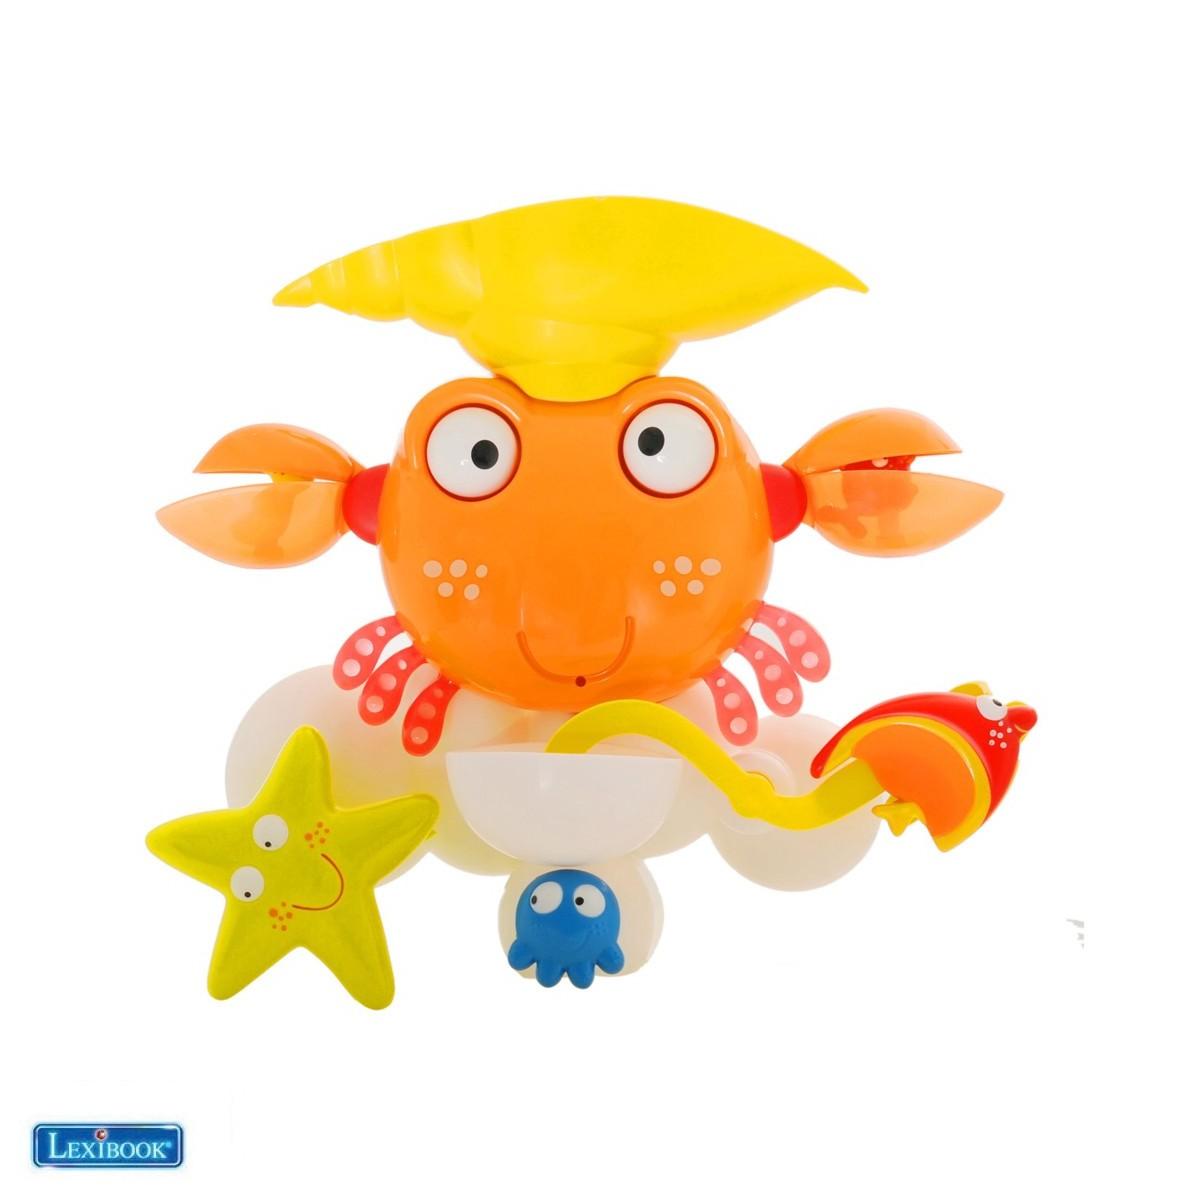 "Jeu de bain ""Water Crab®"", Crabe de bain"